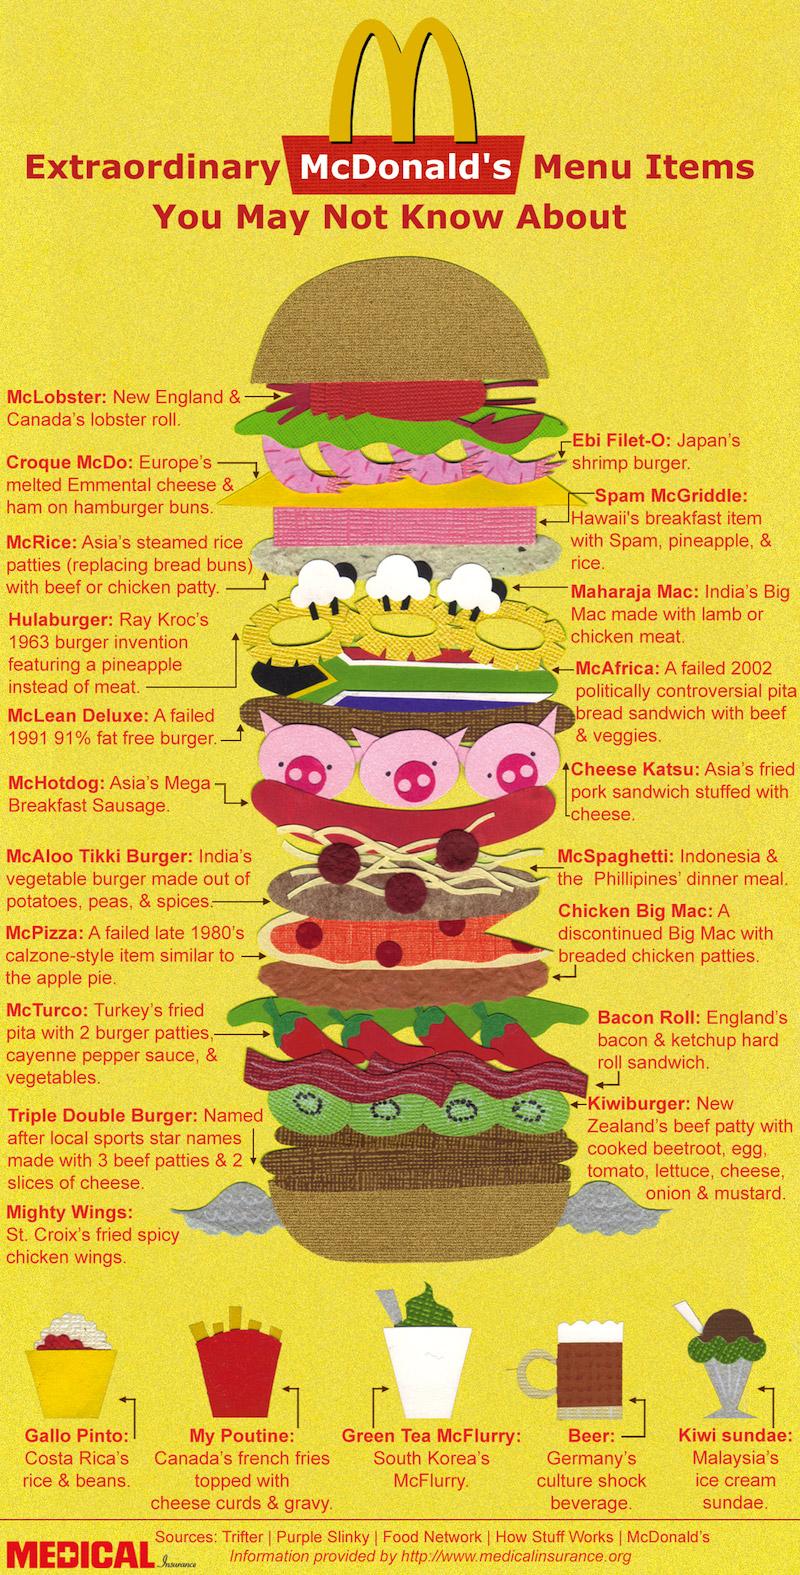 Extraordinary McDonald's Menu Items #infographic